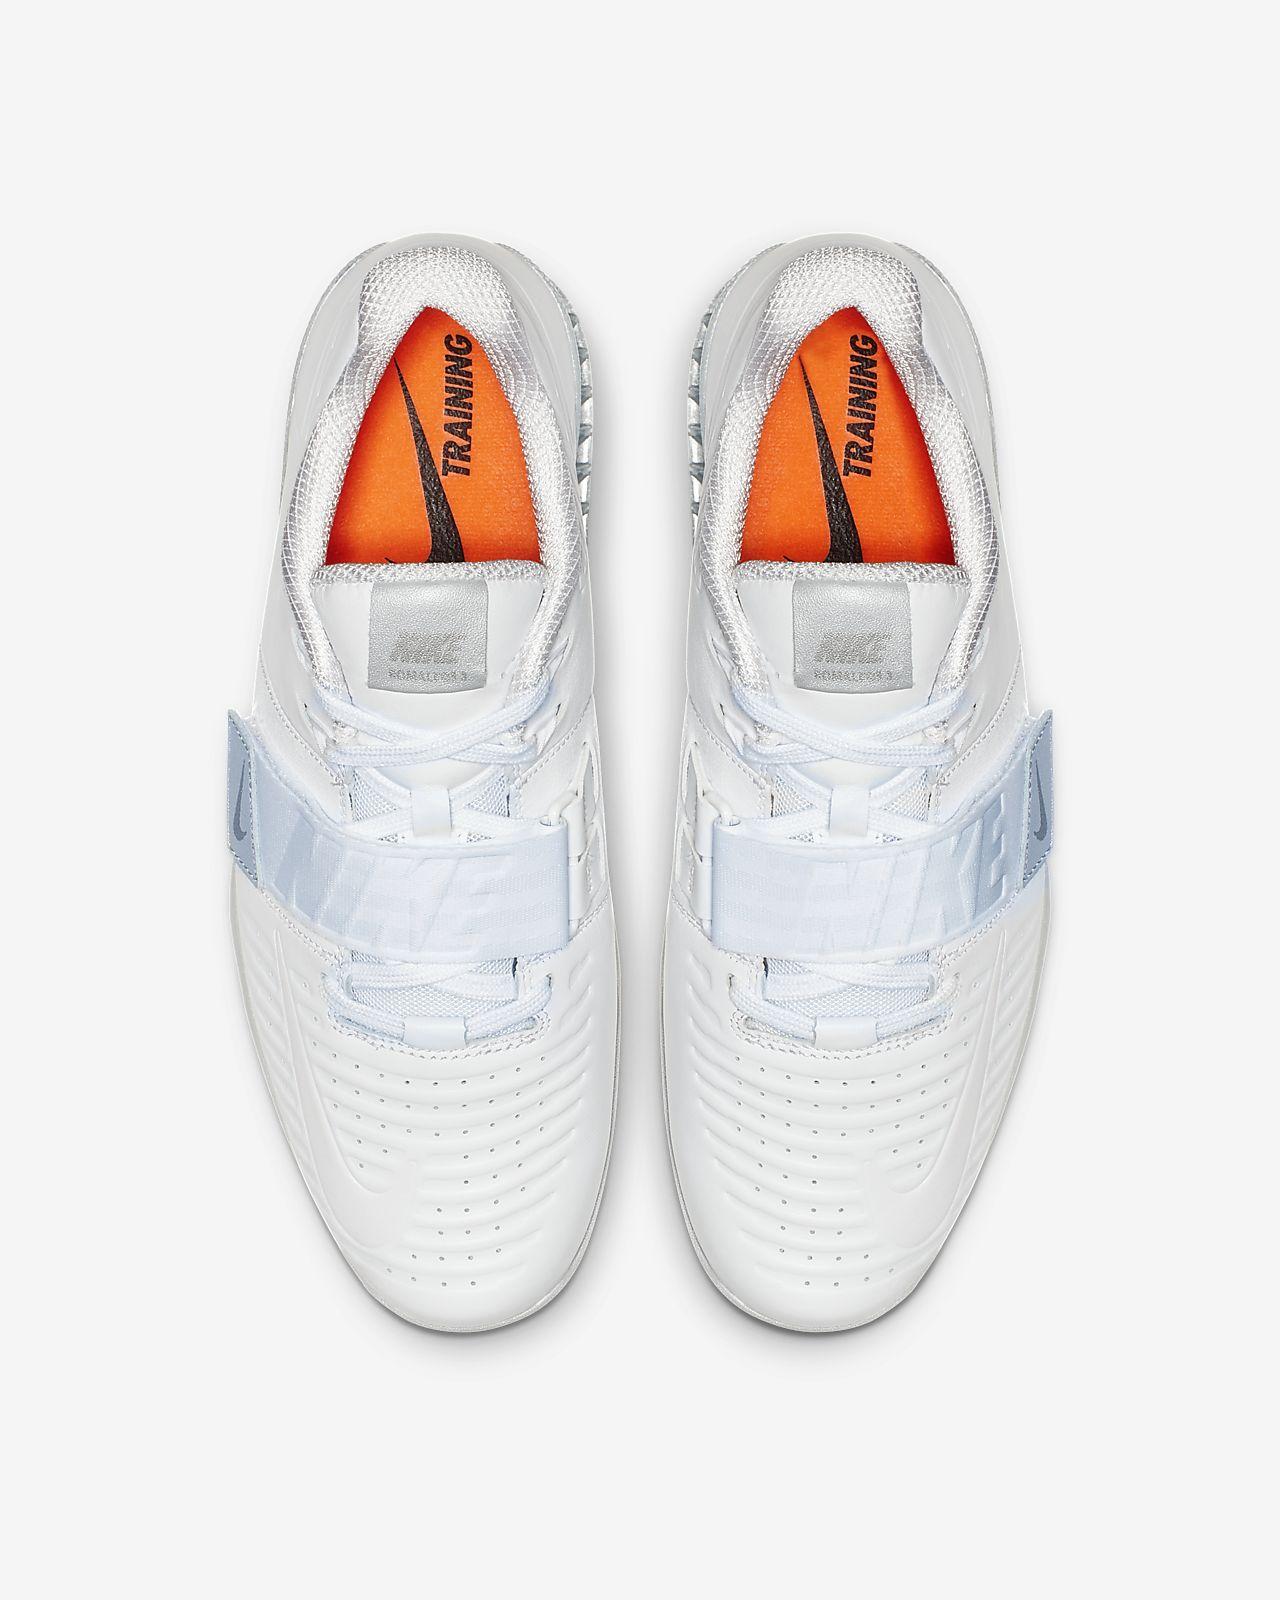 d419f0892046 Nike Romaleos 3 XD Training Shoe. Nike.com CA